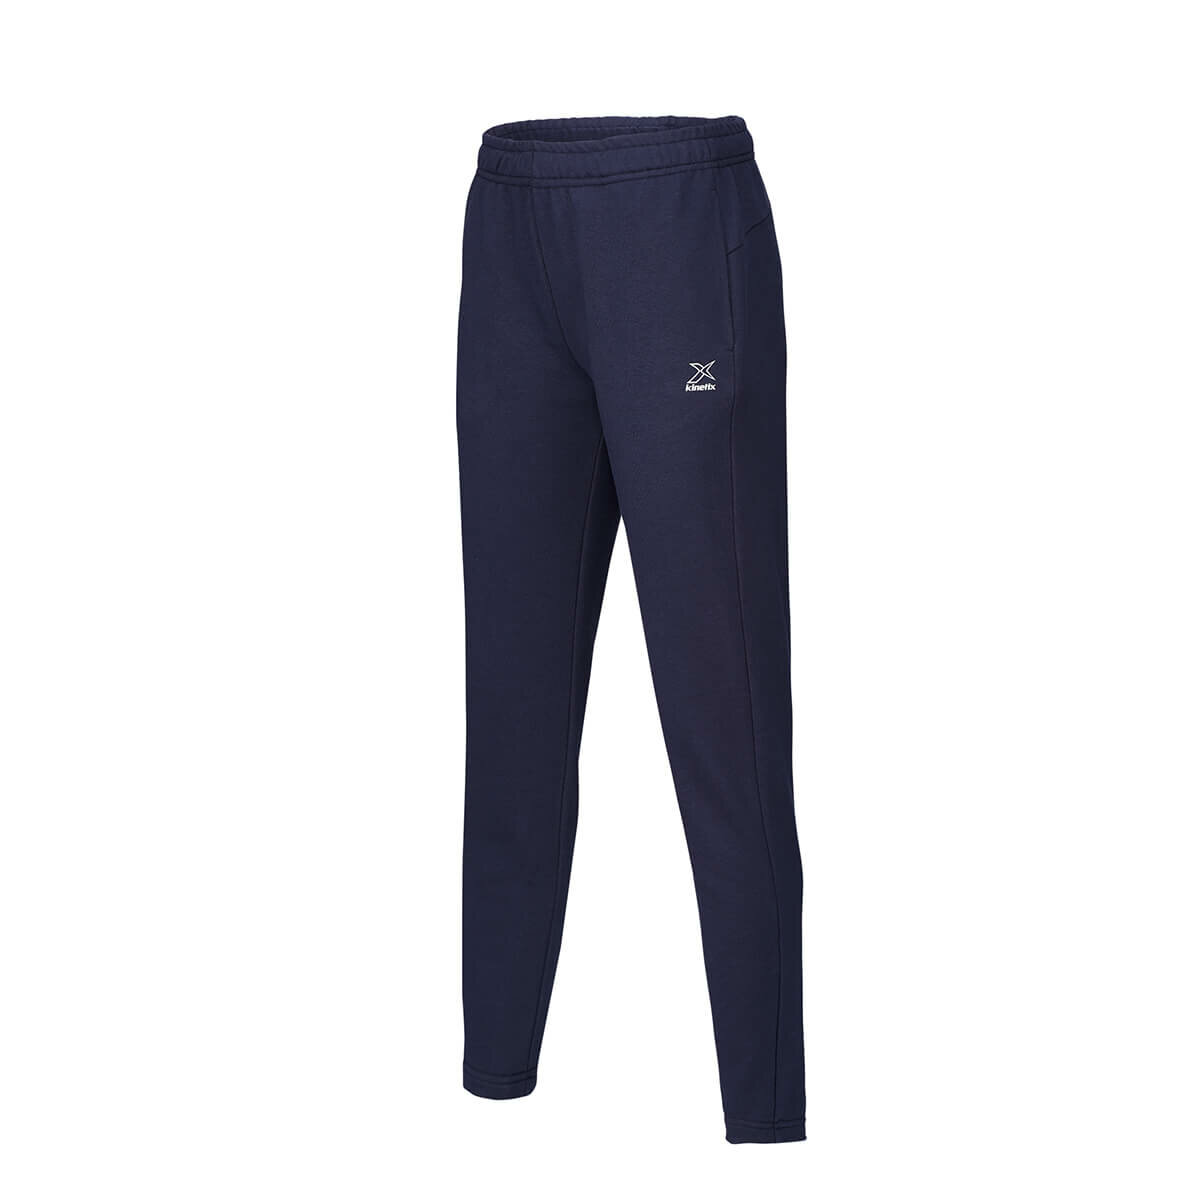 FLO WOMEN BASIC 1 PANTS Navy Blue WOMEN 'S Tracksuit KINETIX